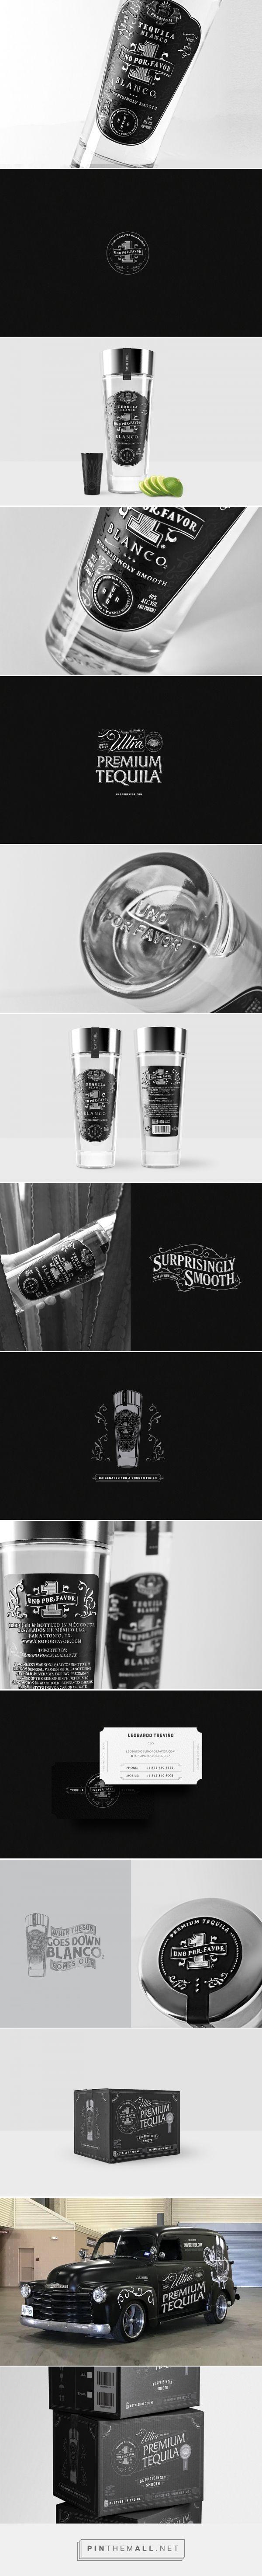 Tequila Uno Por Favor packaging design by Mayorque Studio - https://www.packagingoftheworld.com/2018/04/tequila-uno-por-favor.html